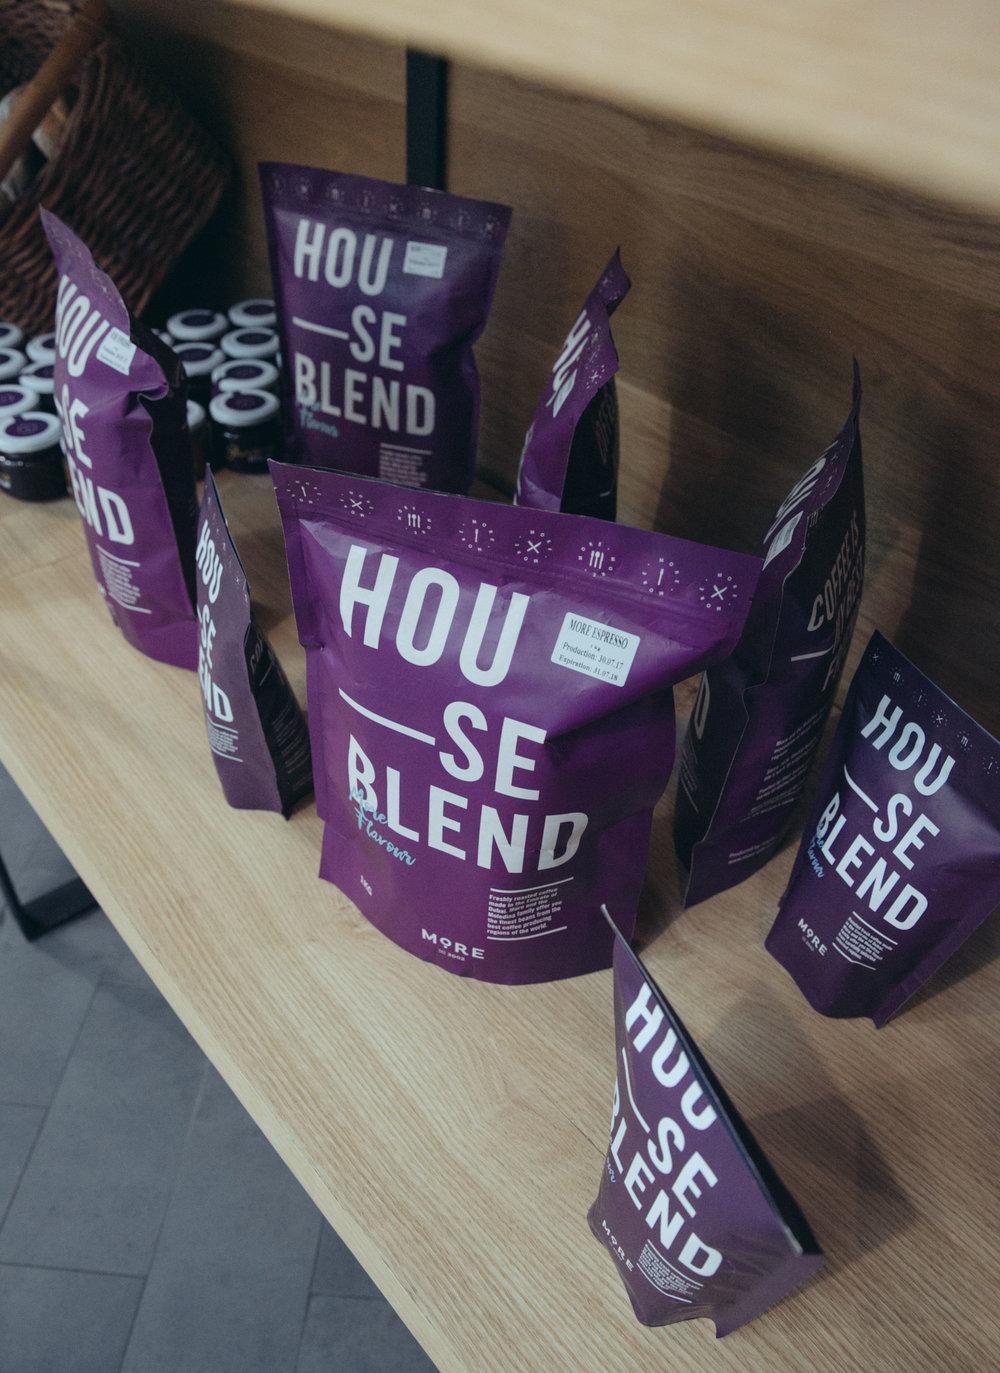 More Marooj house blend coffee